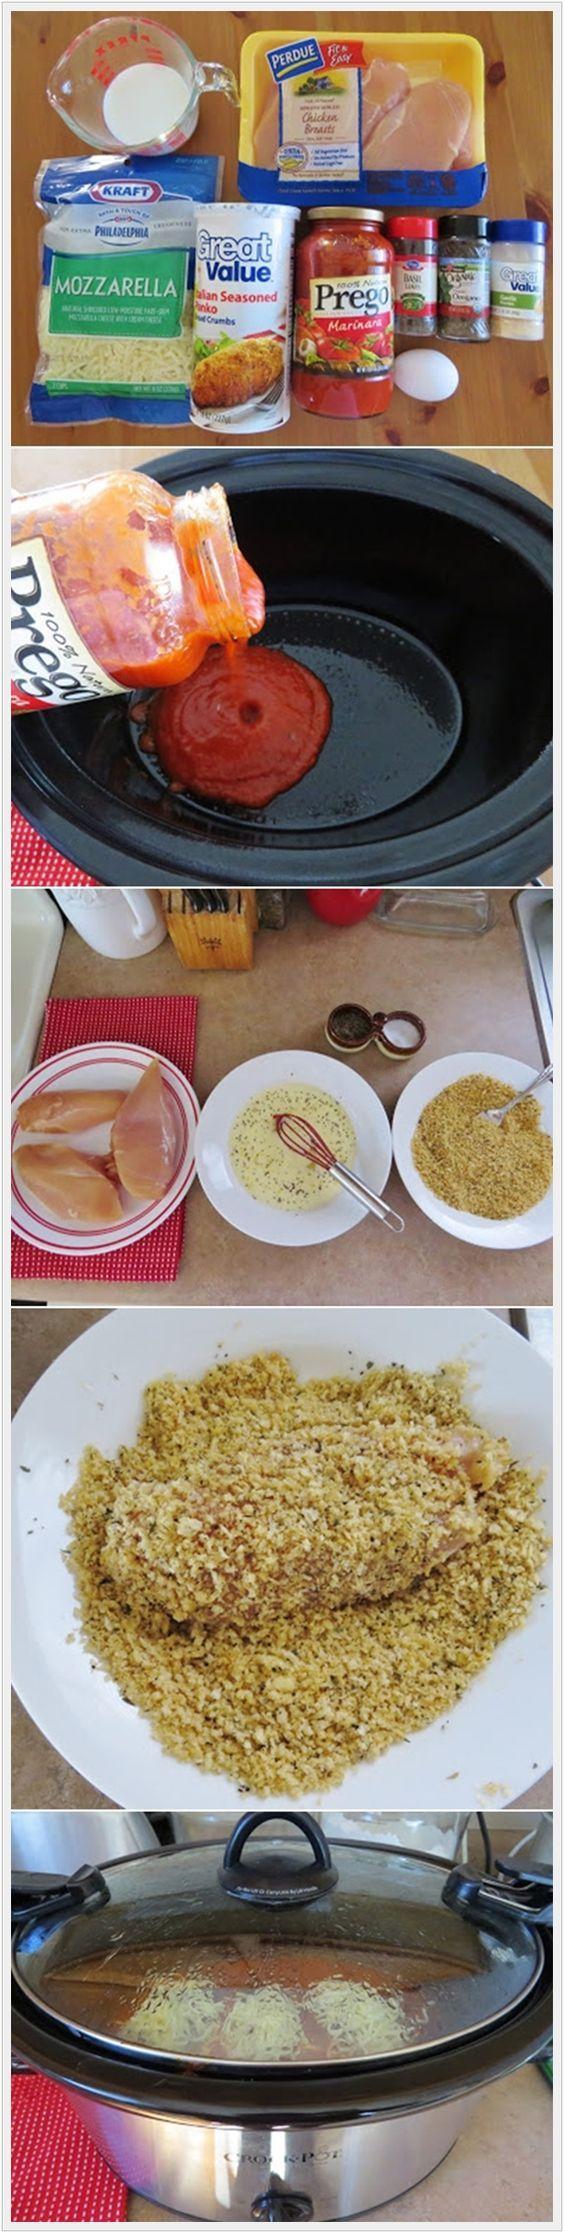 Olla de barro pollo parmesano